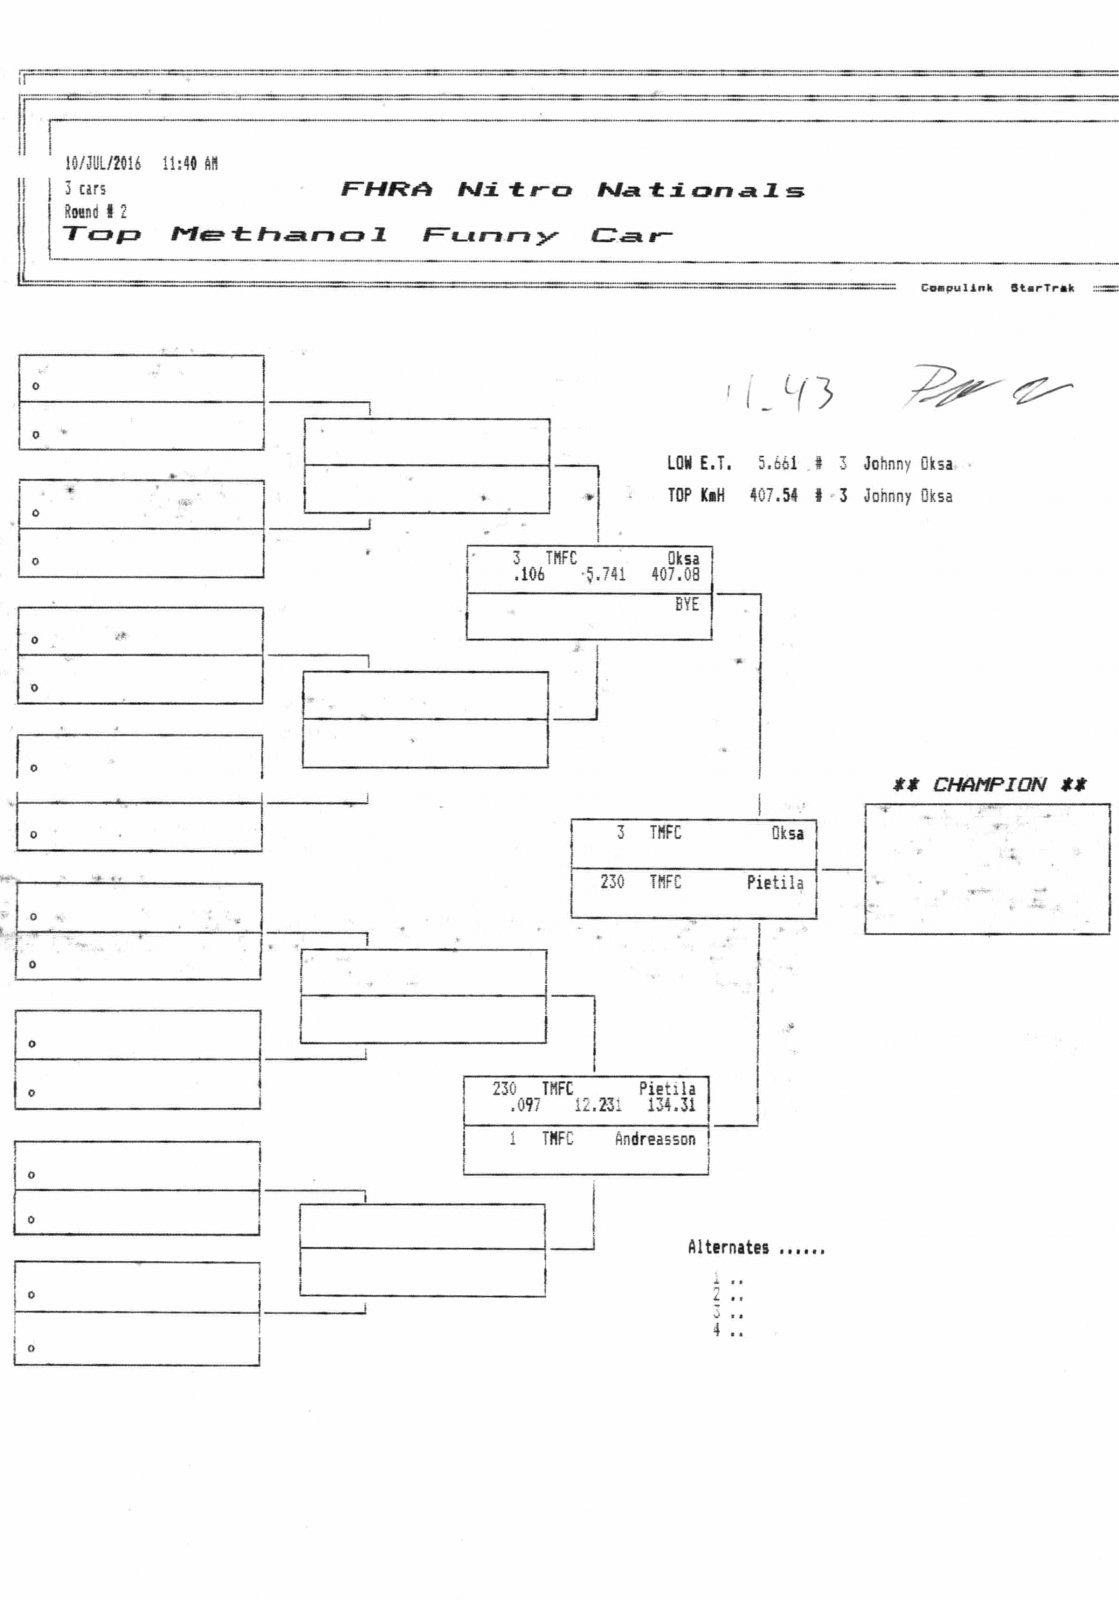 FHRA Nitro results 001.jpg